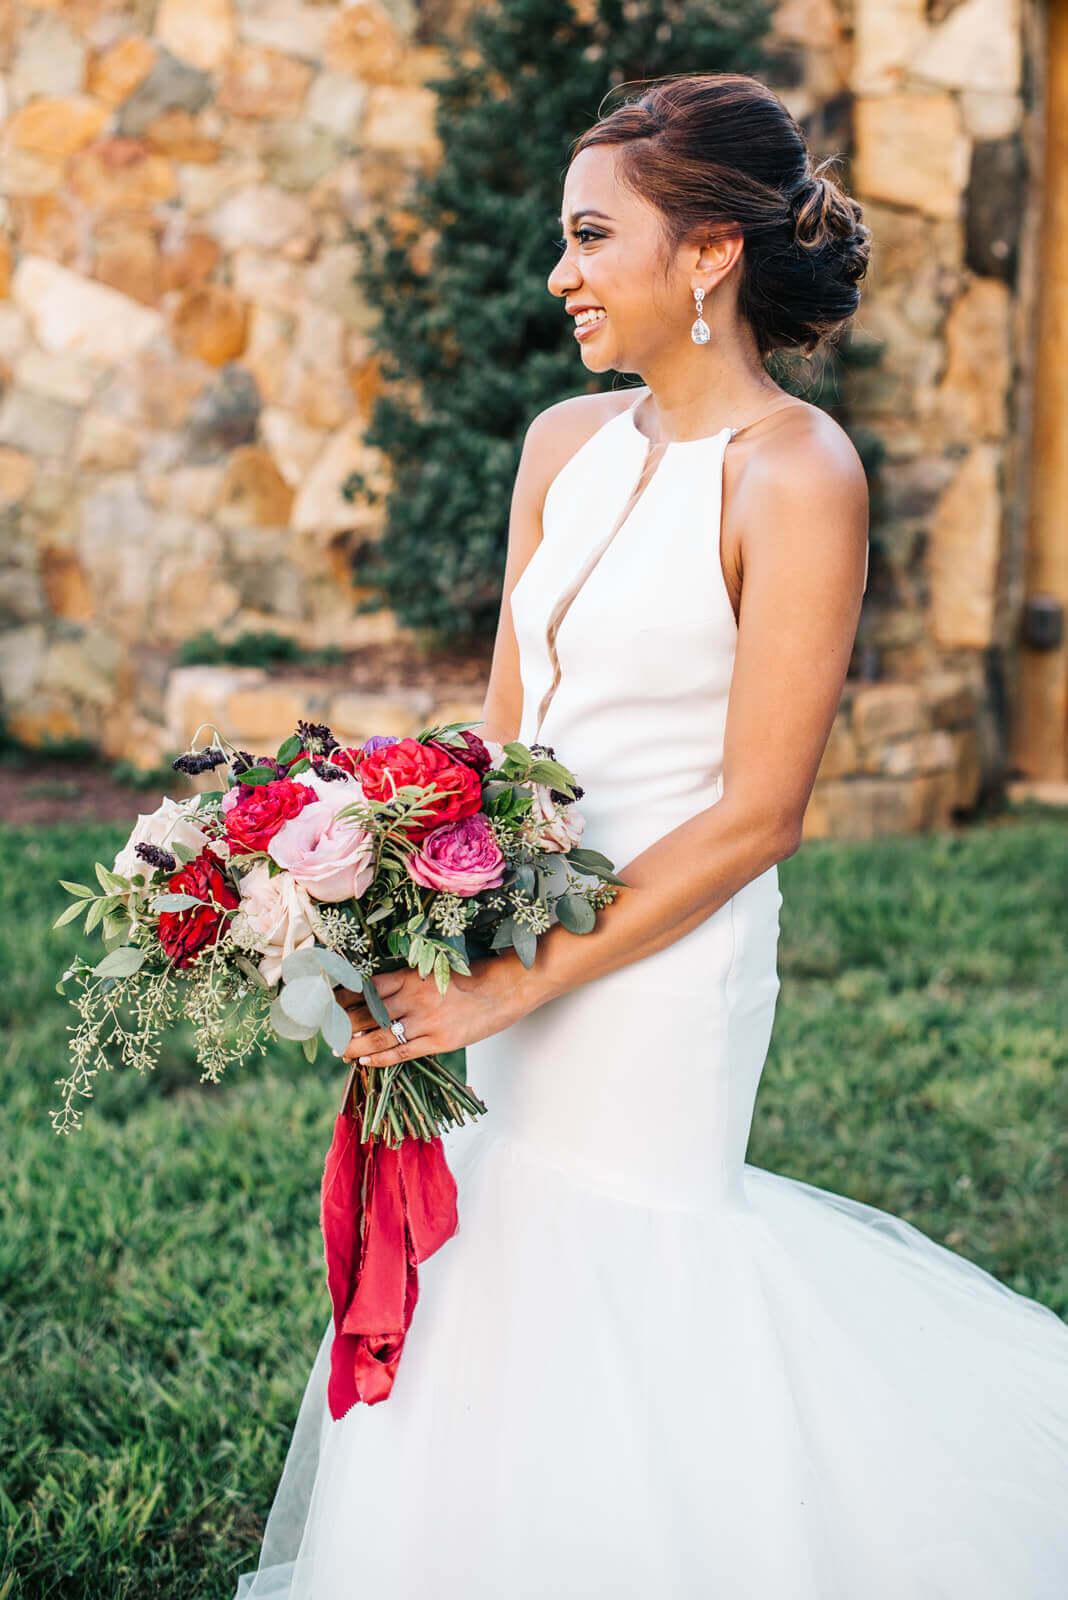 Stone Tower Winery wedding (3).jpg